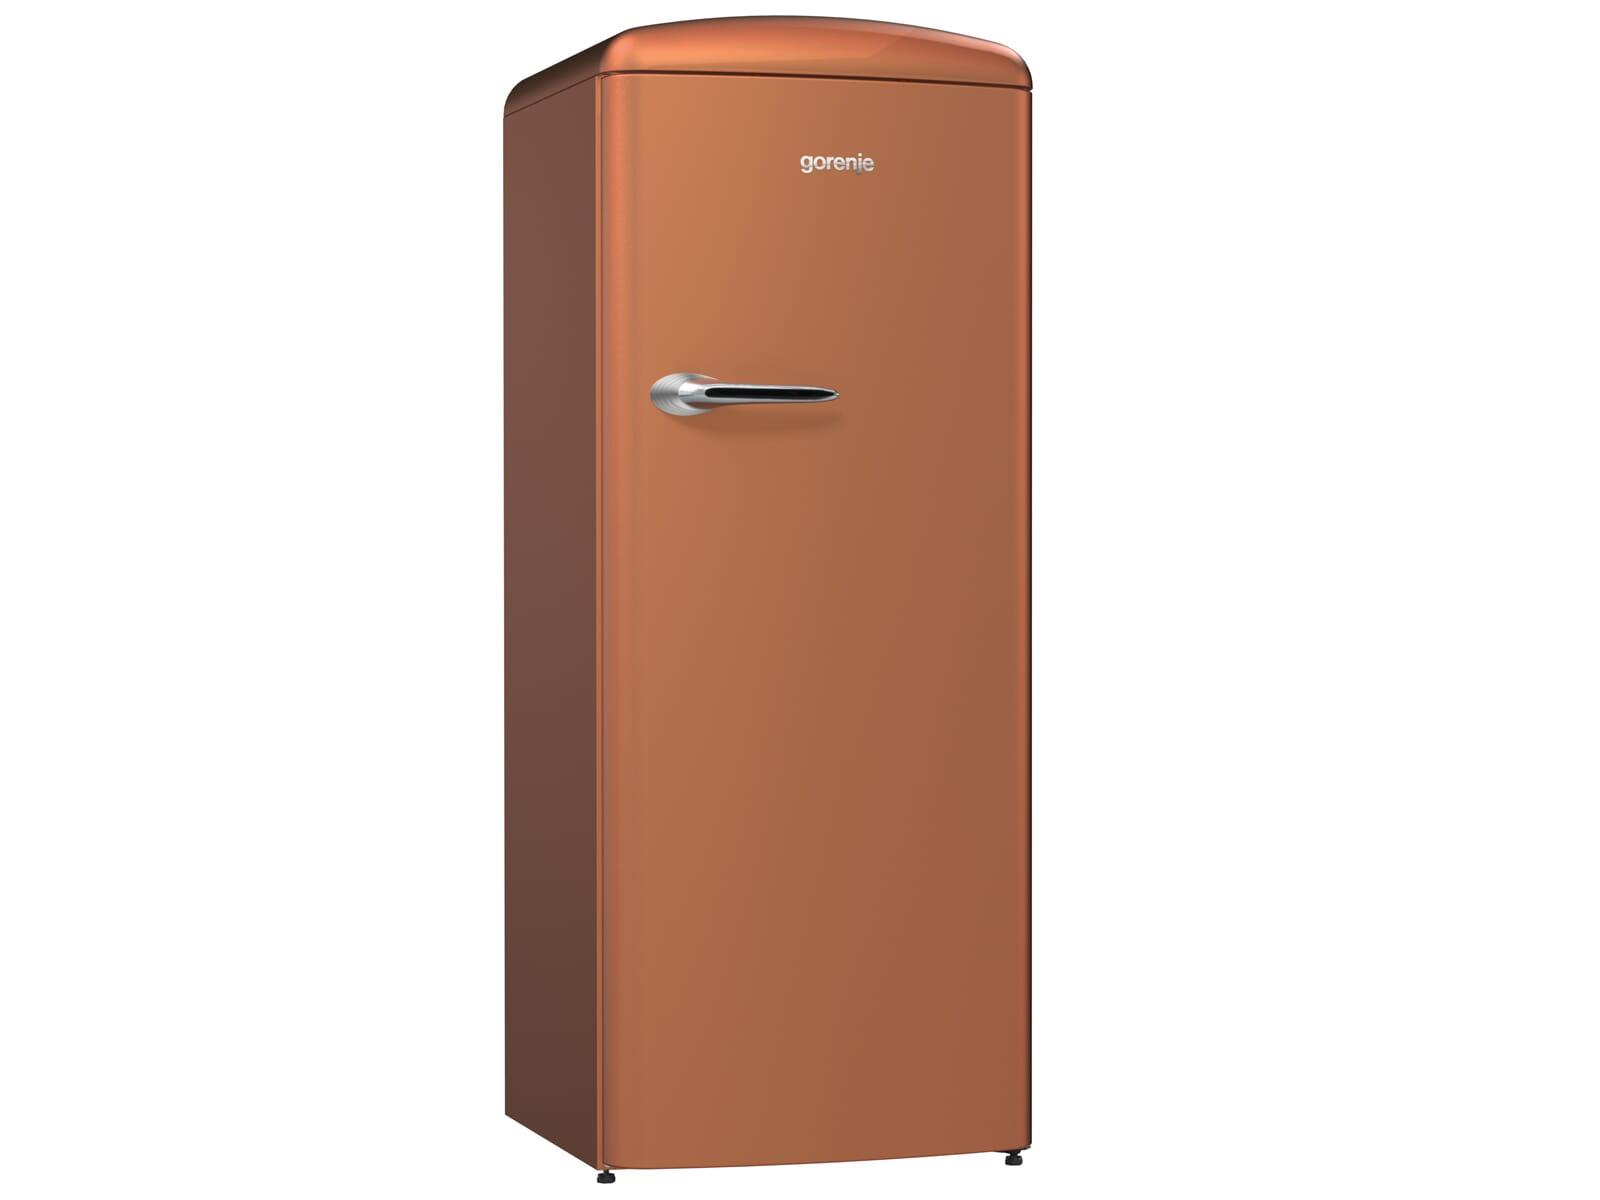 Gorenje ORB 153 CR Standkühlschrank Copper